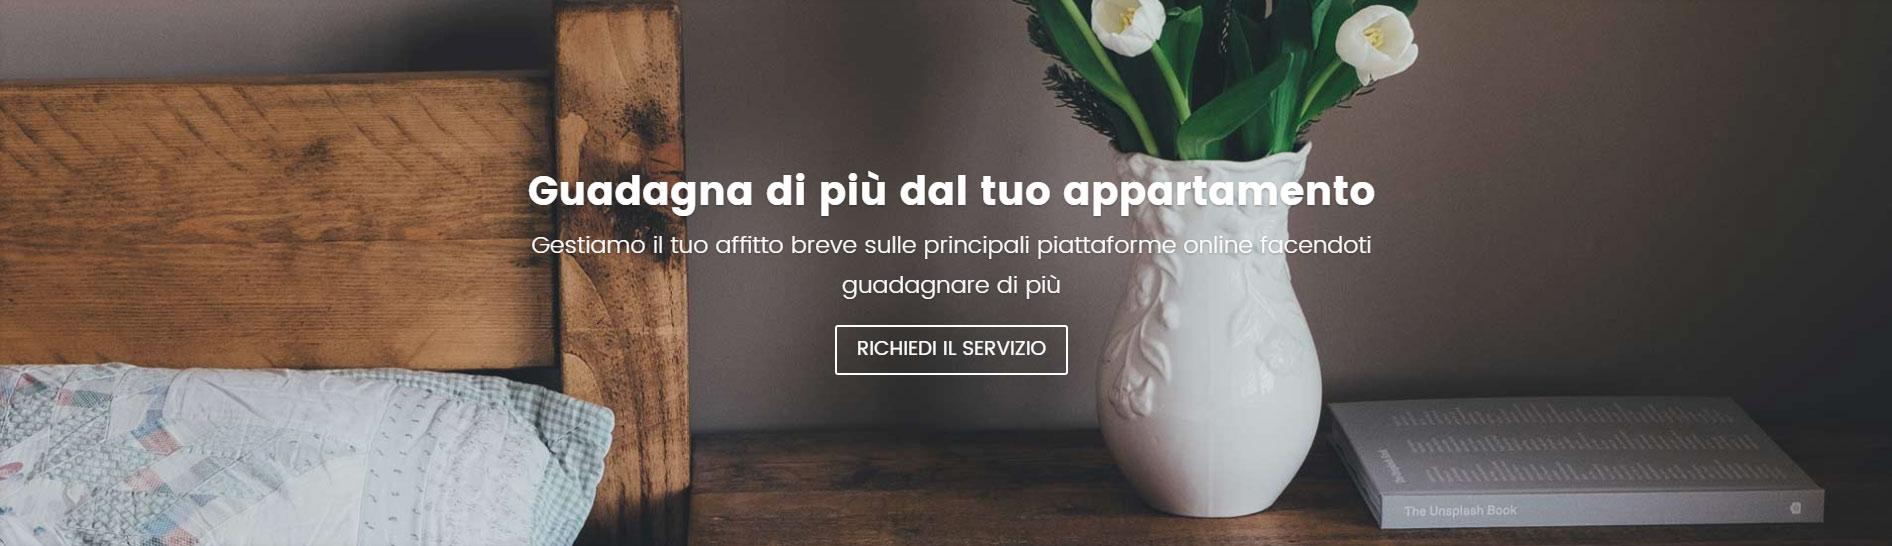 banner_affitto_breve